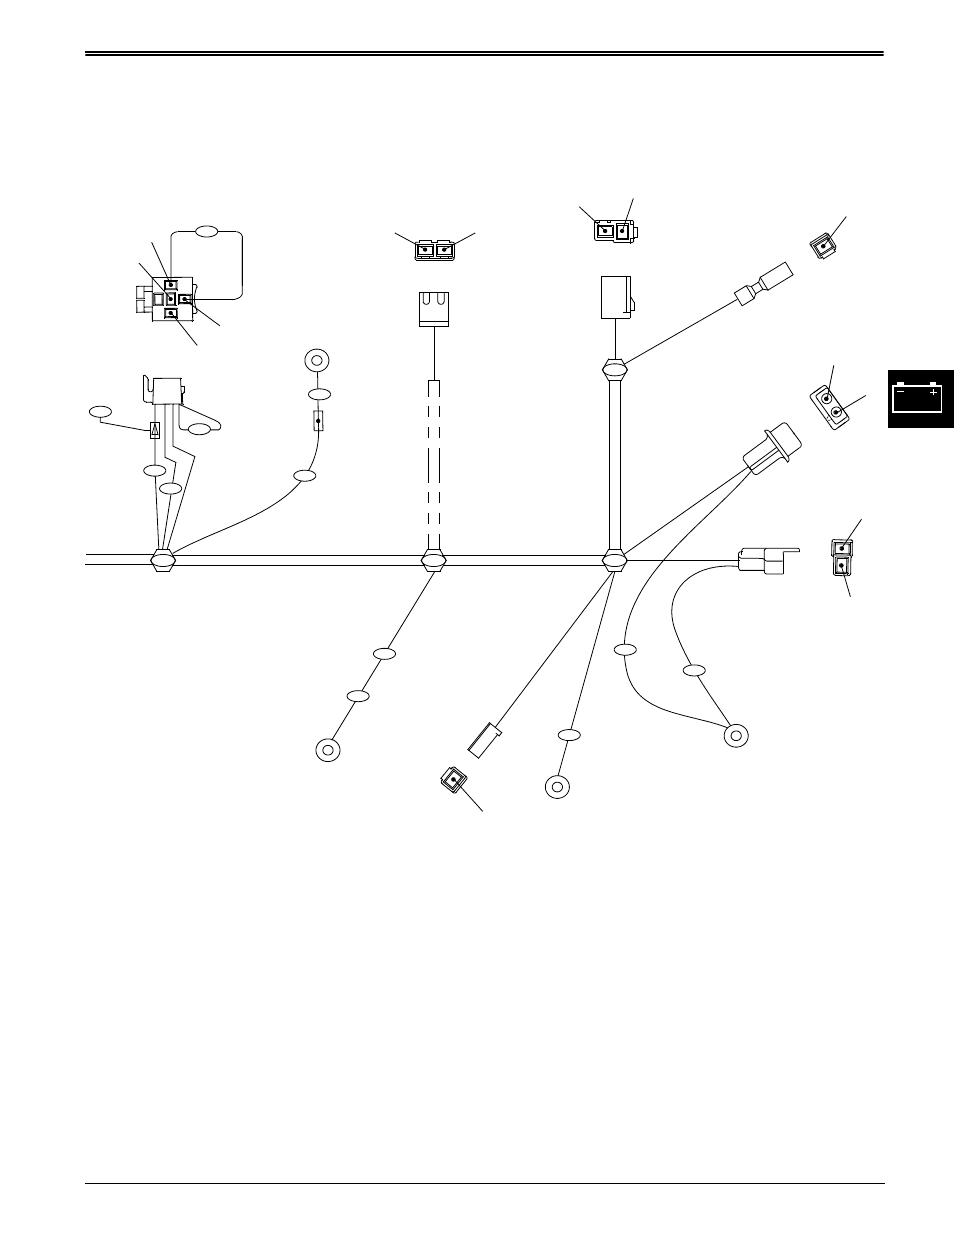 John Deere 212 Wiring Harnes Lawn Tractor 210 Diagram Medium Resolution Of Harness Diagrams Electrical Stx38 User Manual Page 97 314